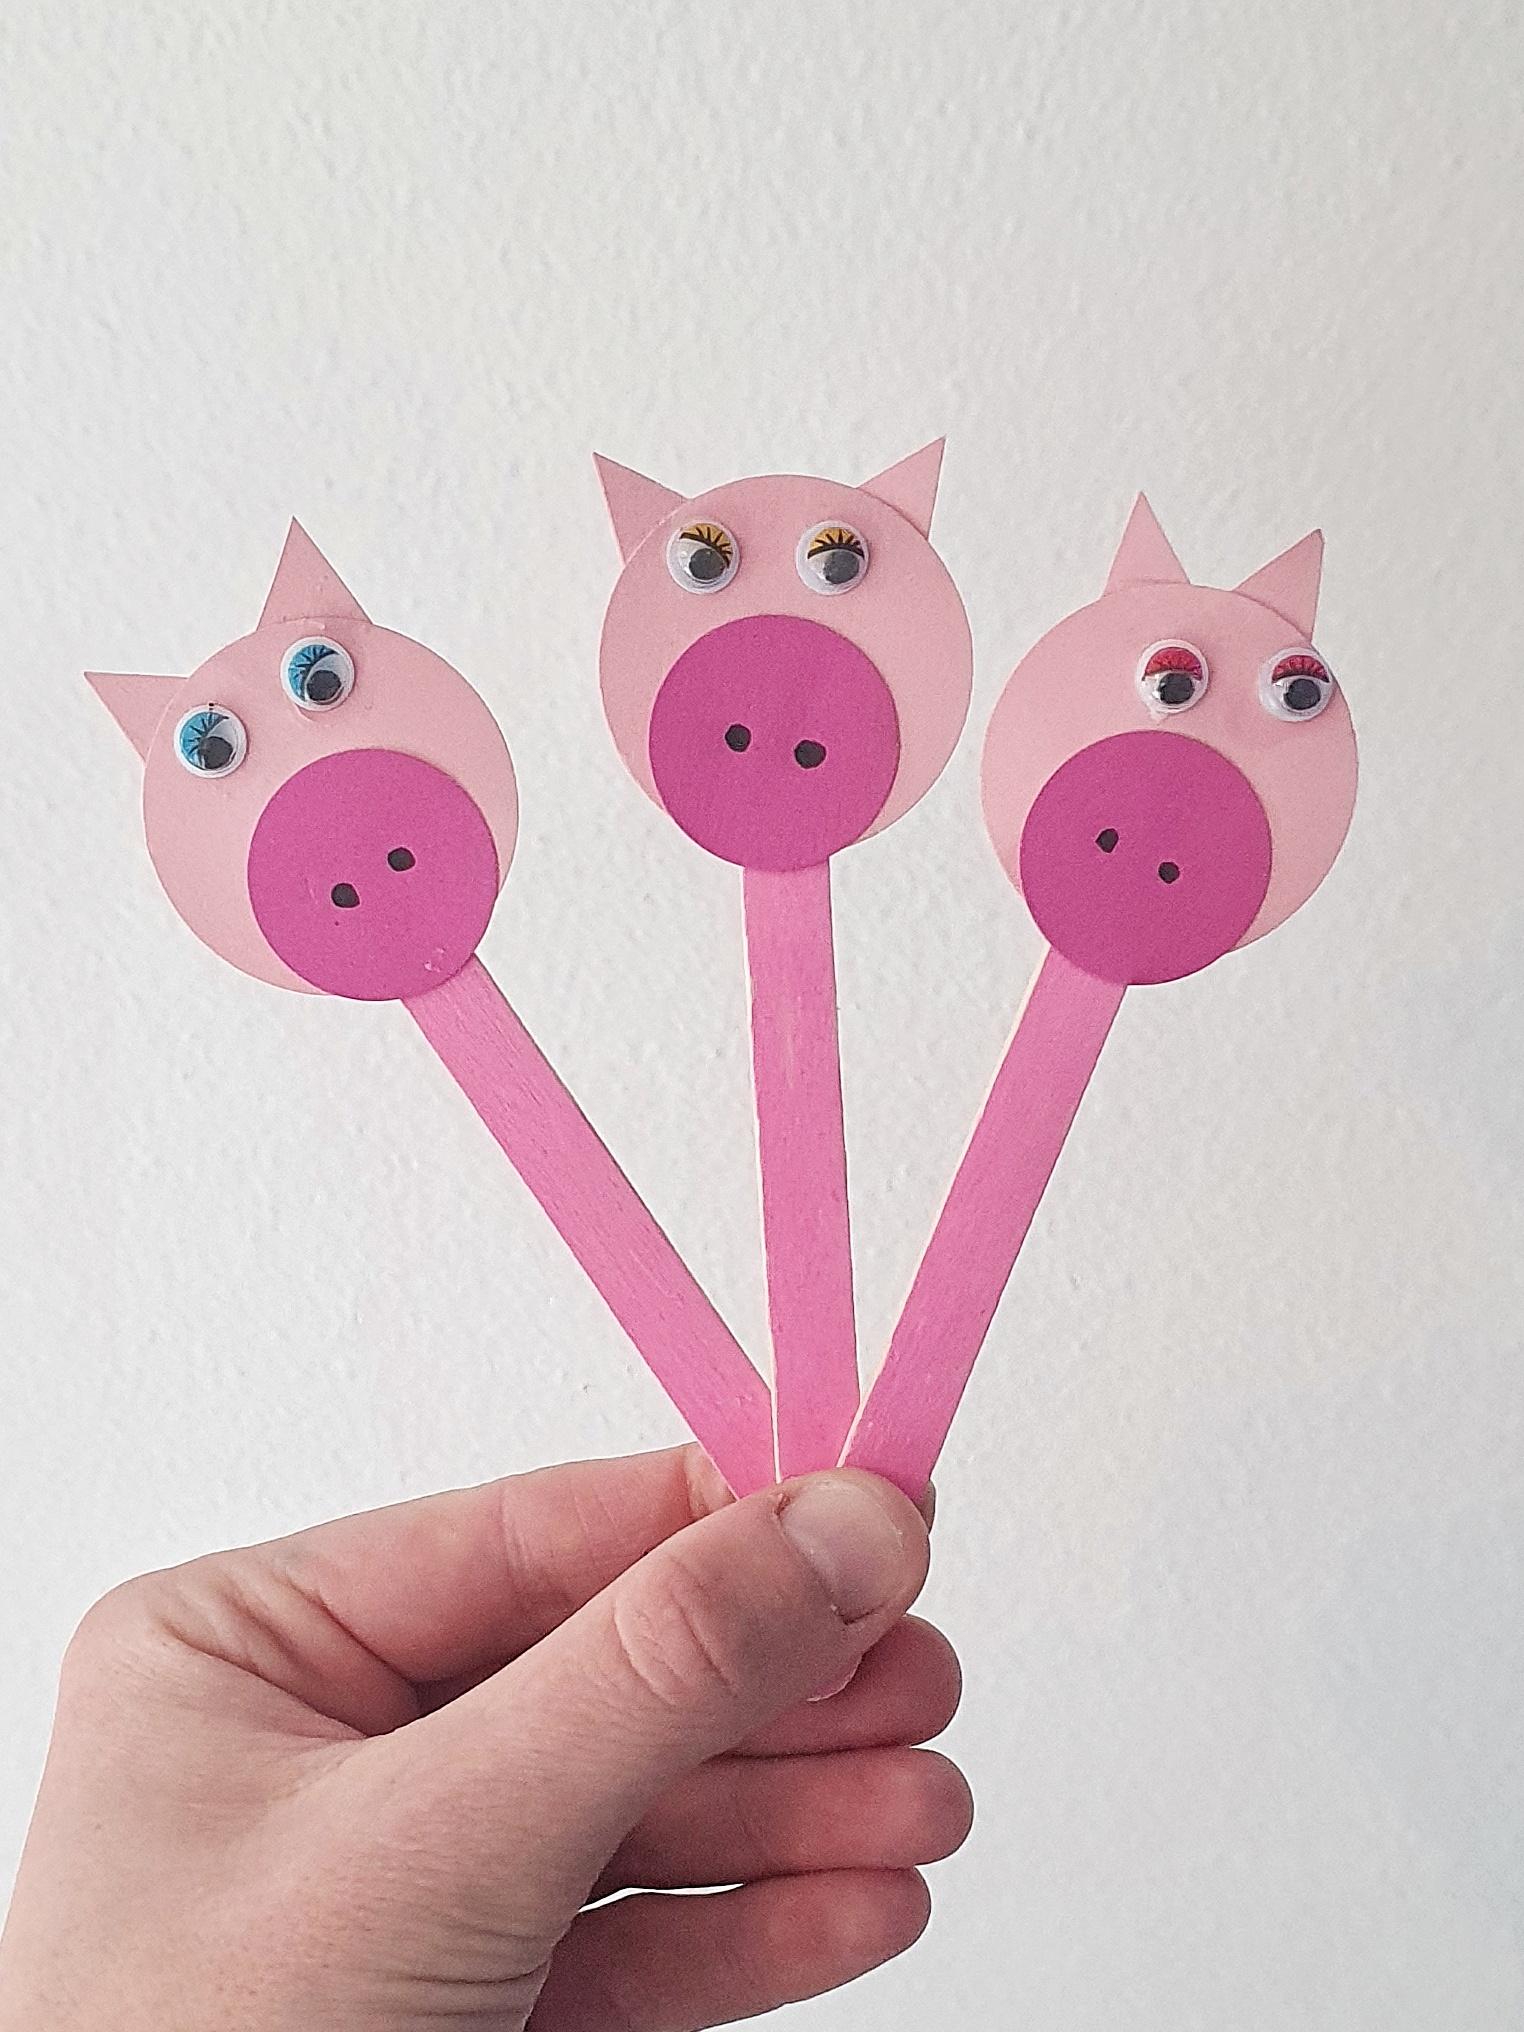 Dukketeater: de 3 små grise og ulven